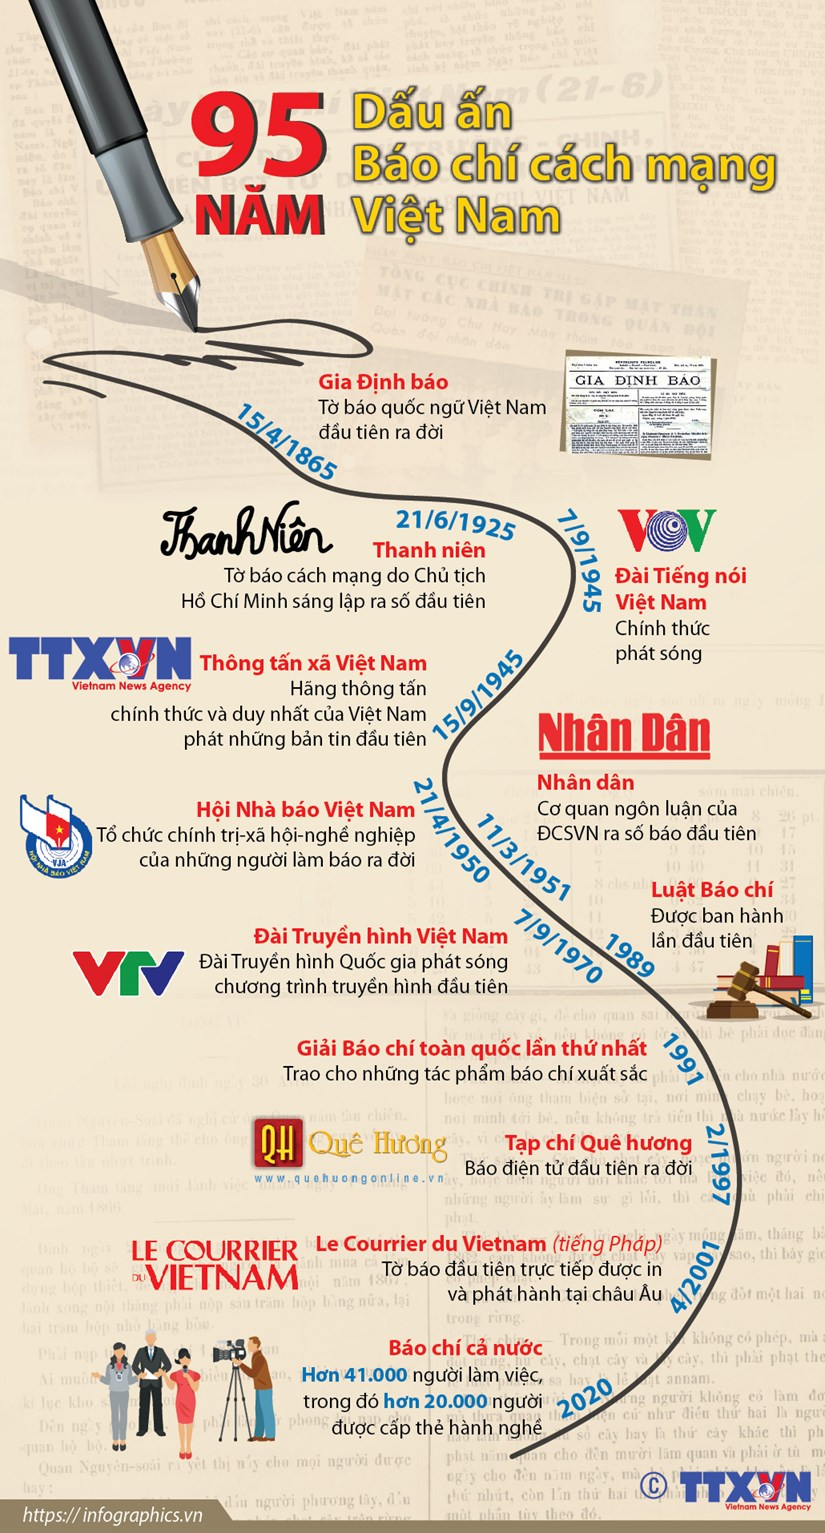 [Infographics] Dau an 95 nam bao chi cach mang Viet Nam hinh anh 1